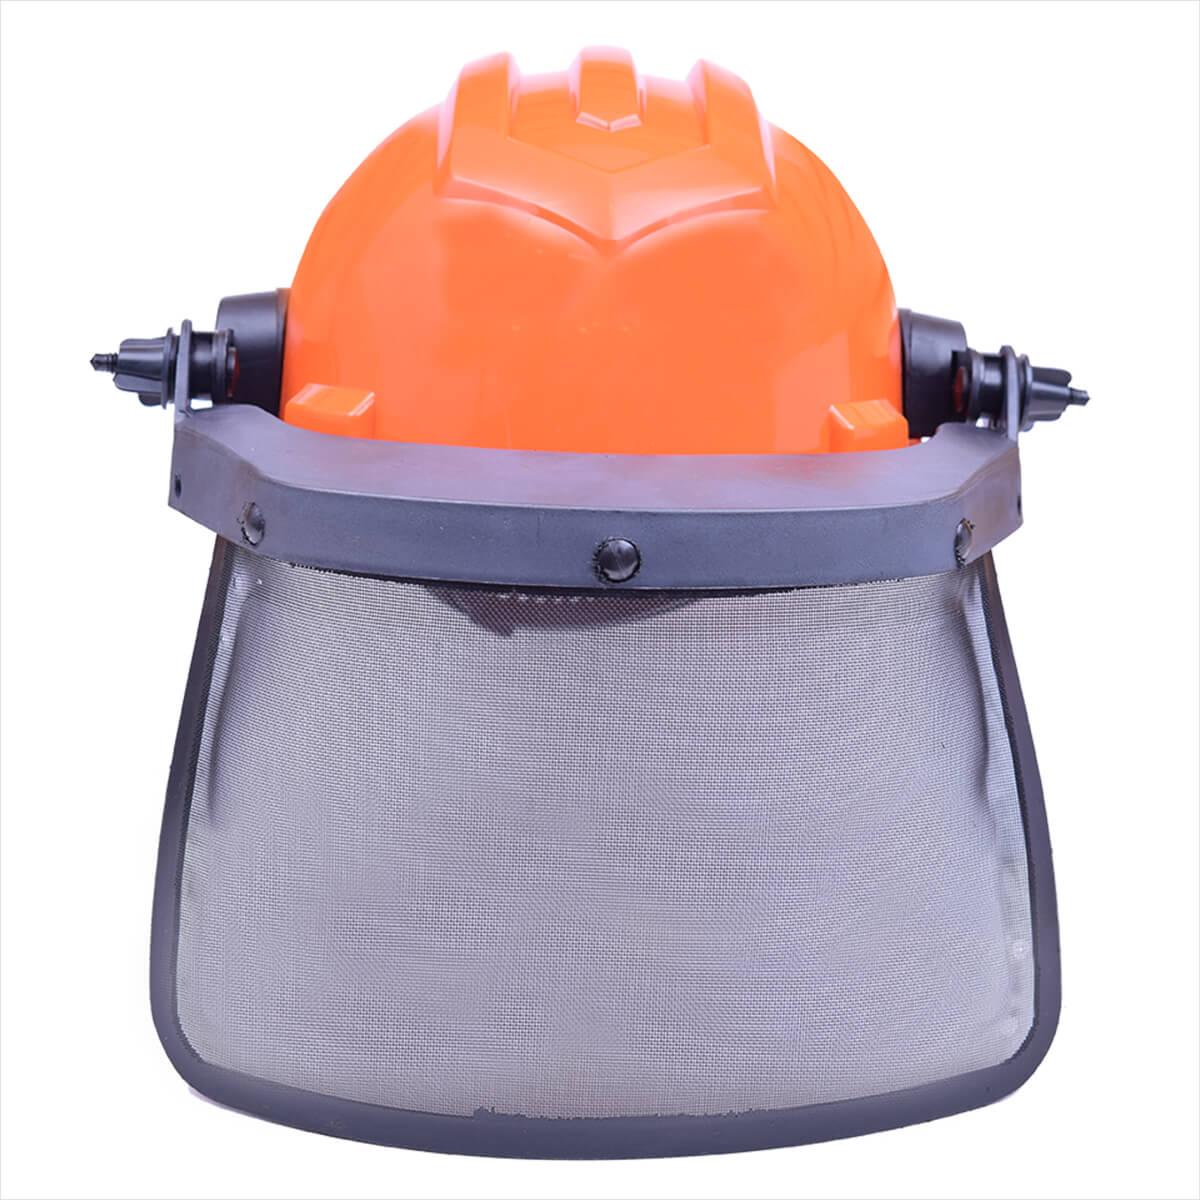 0500ed702a83b Capacete De Segurança Laranja Com Protetor Facial Telado Ledan